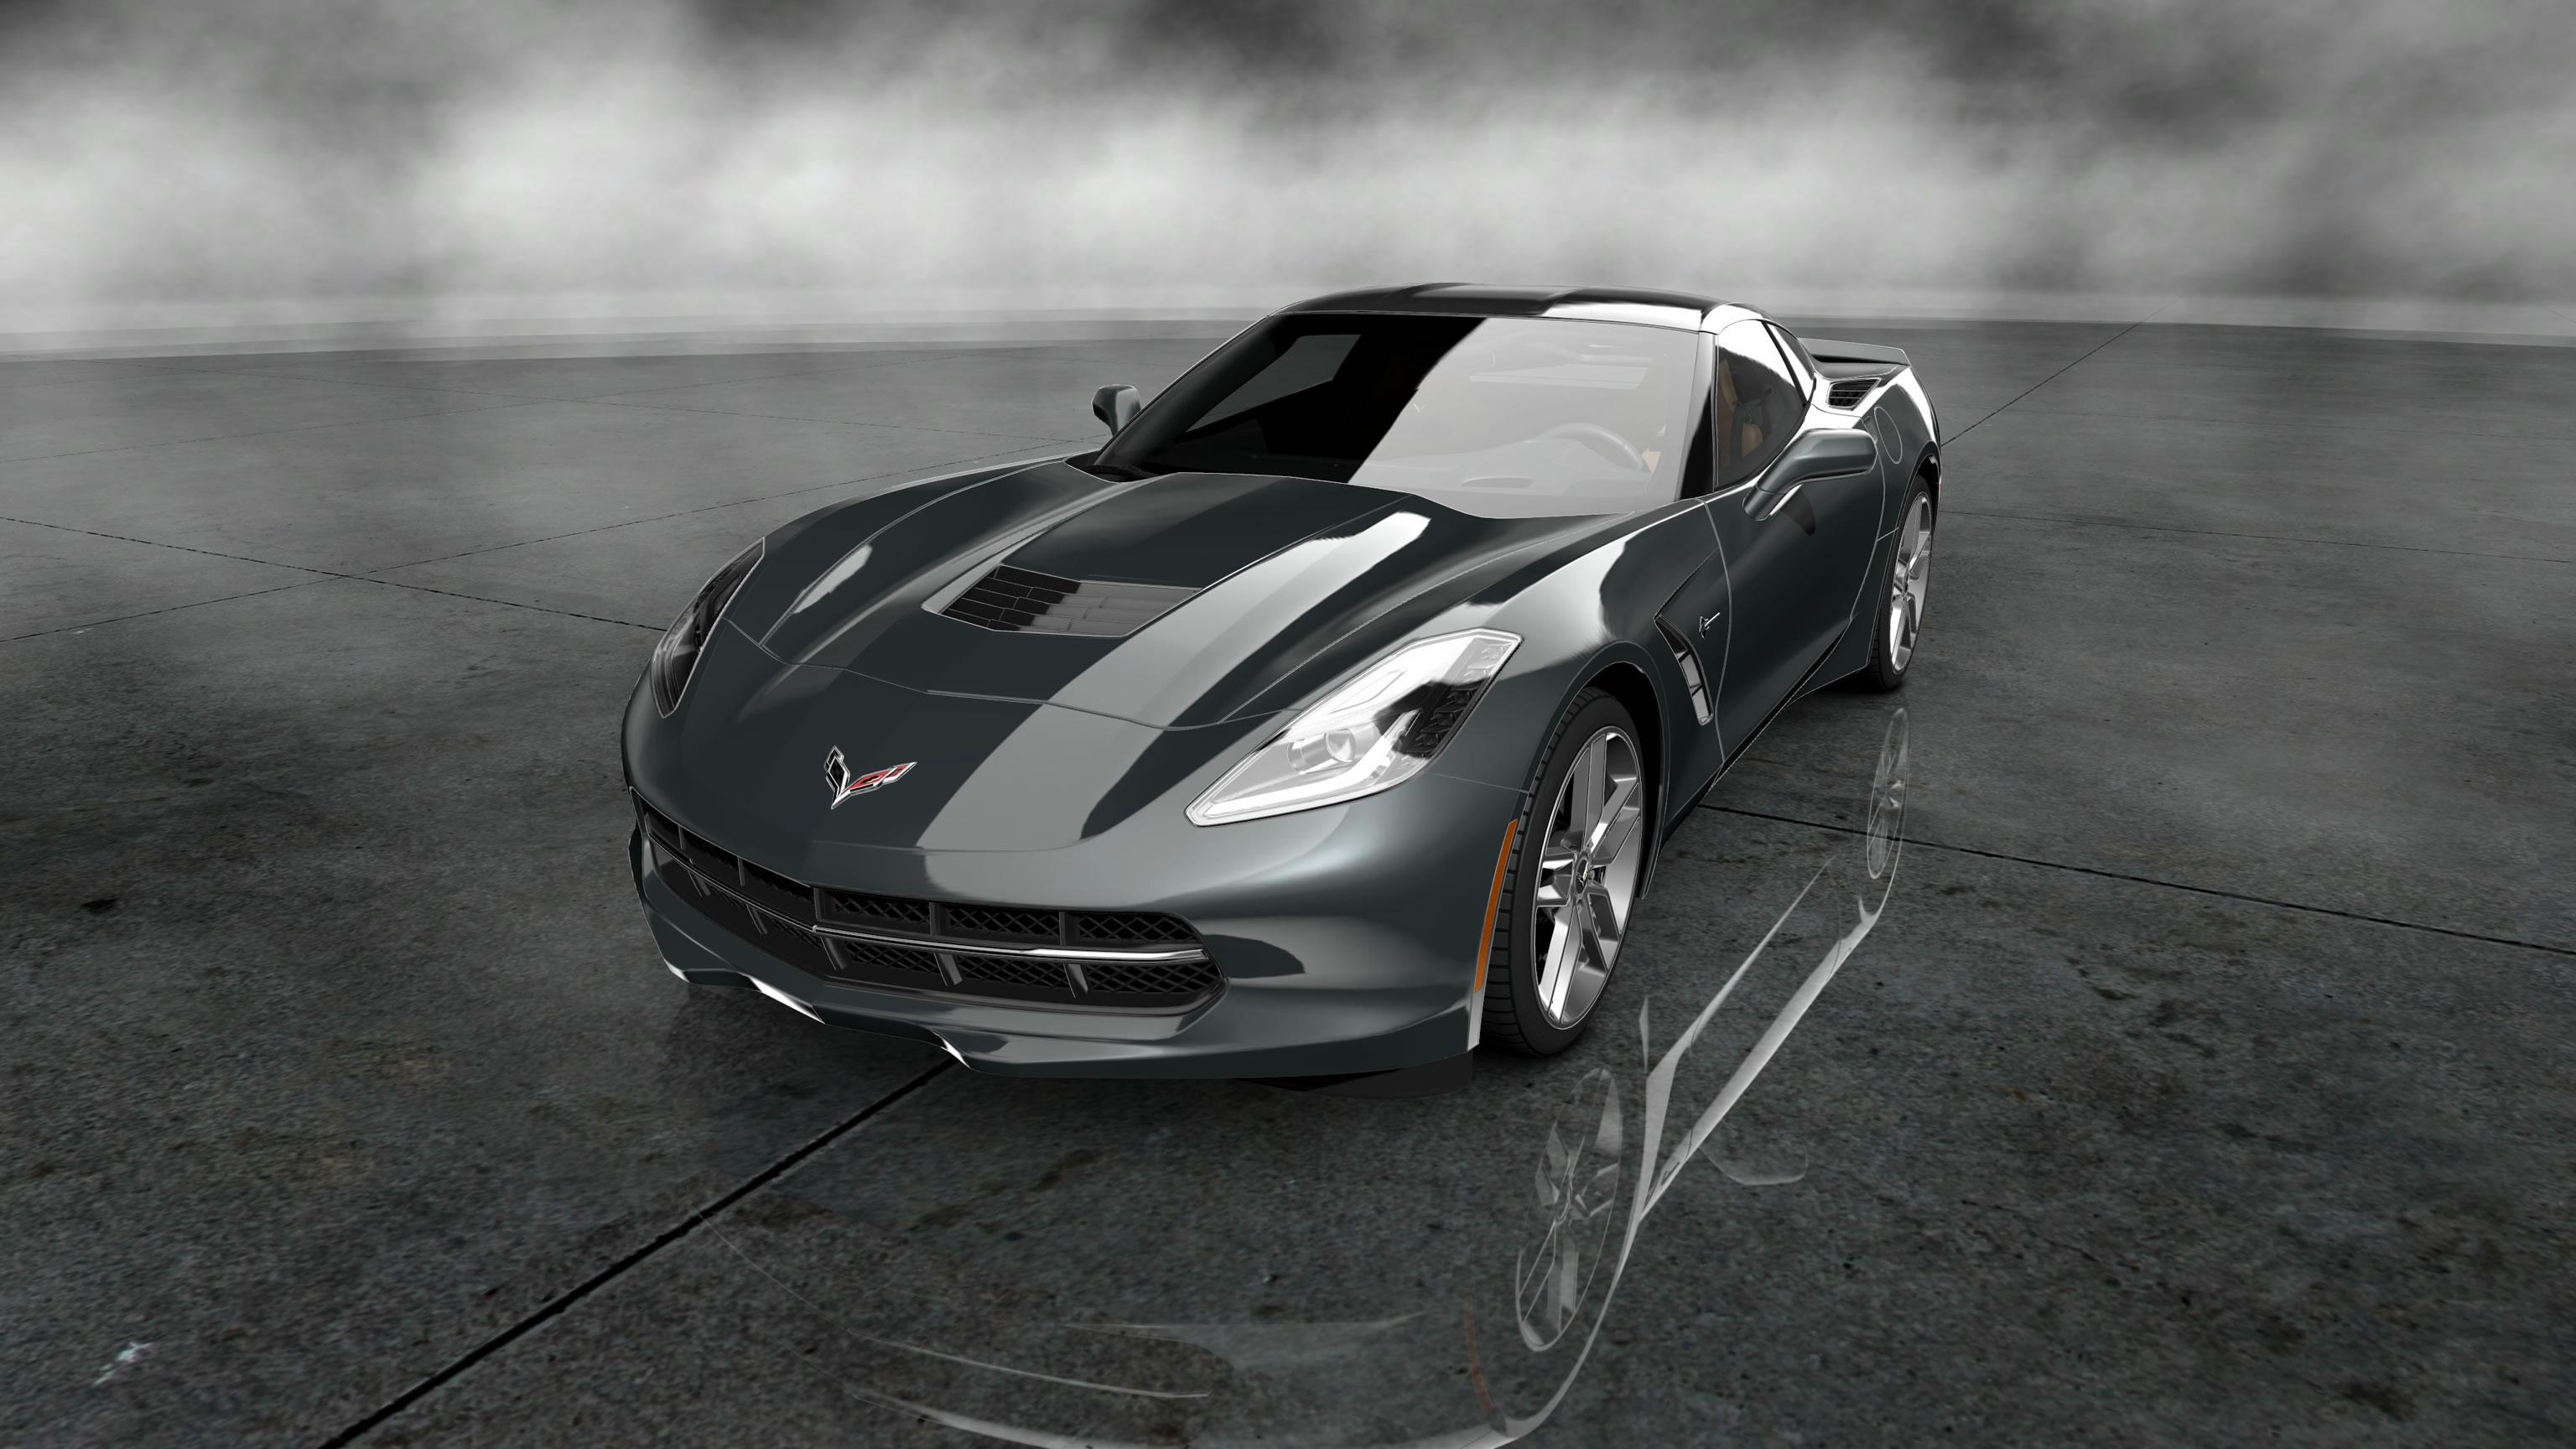 free download 2014 Corvette Stingray Wallpaper For Desktop 3072x1728